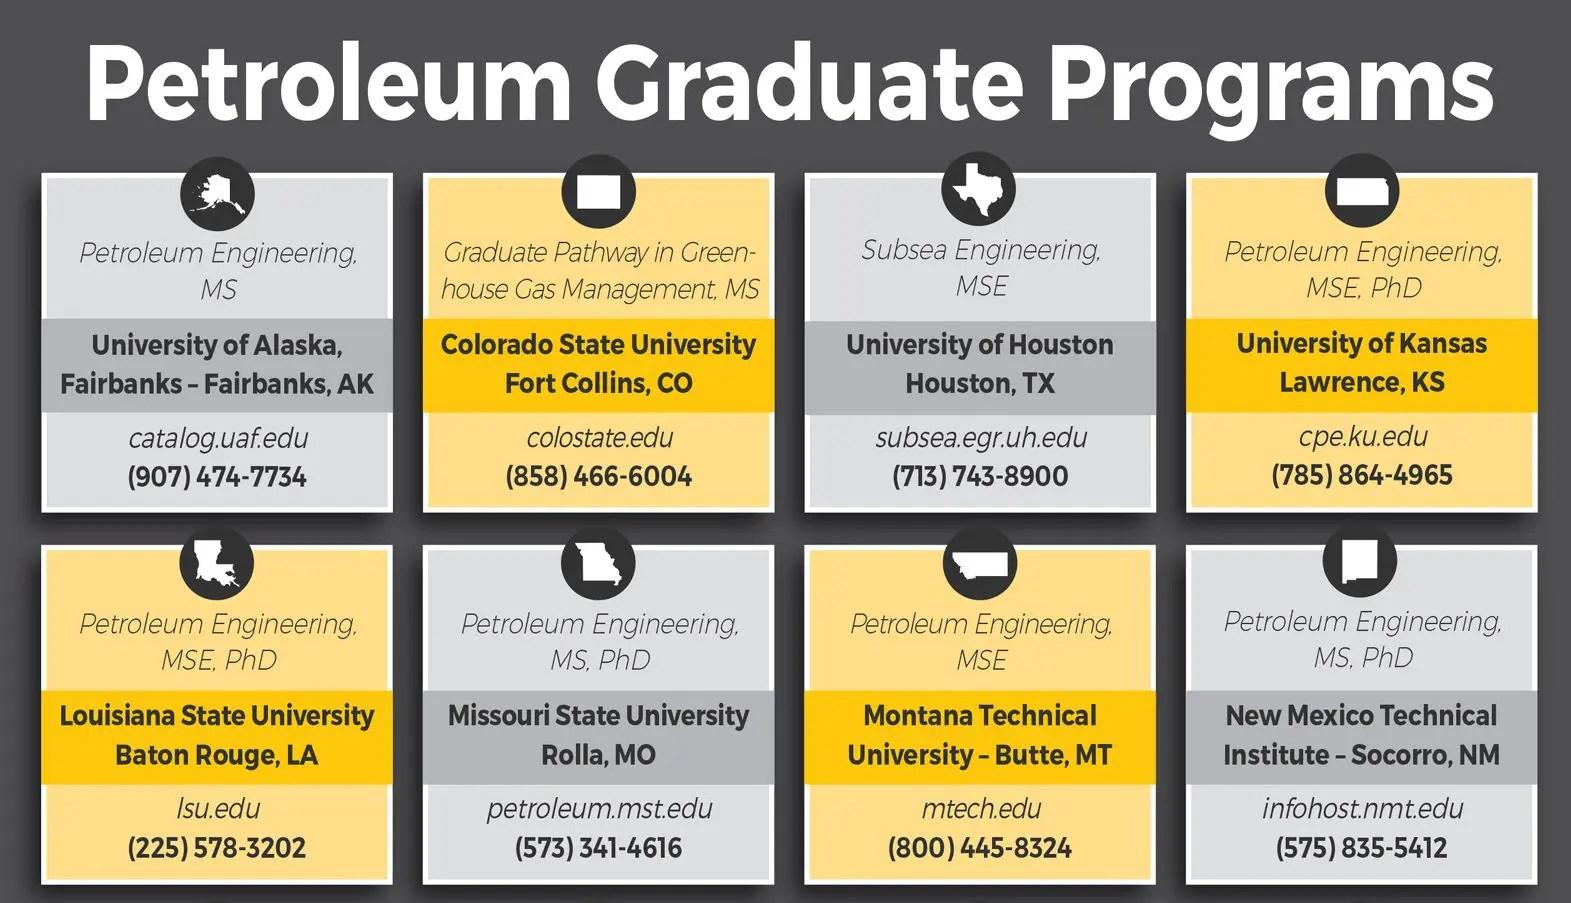 Petroleum Graduate Programs